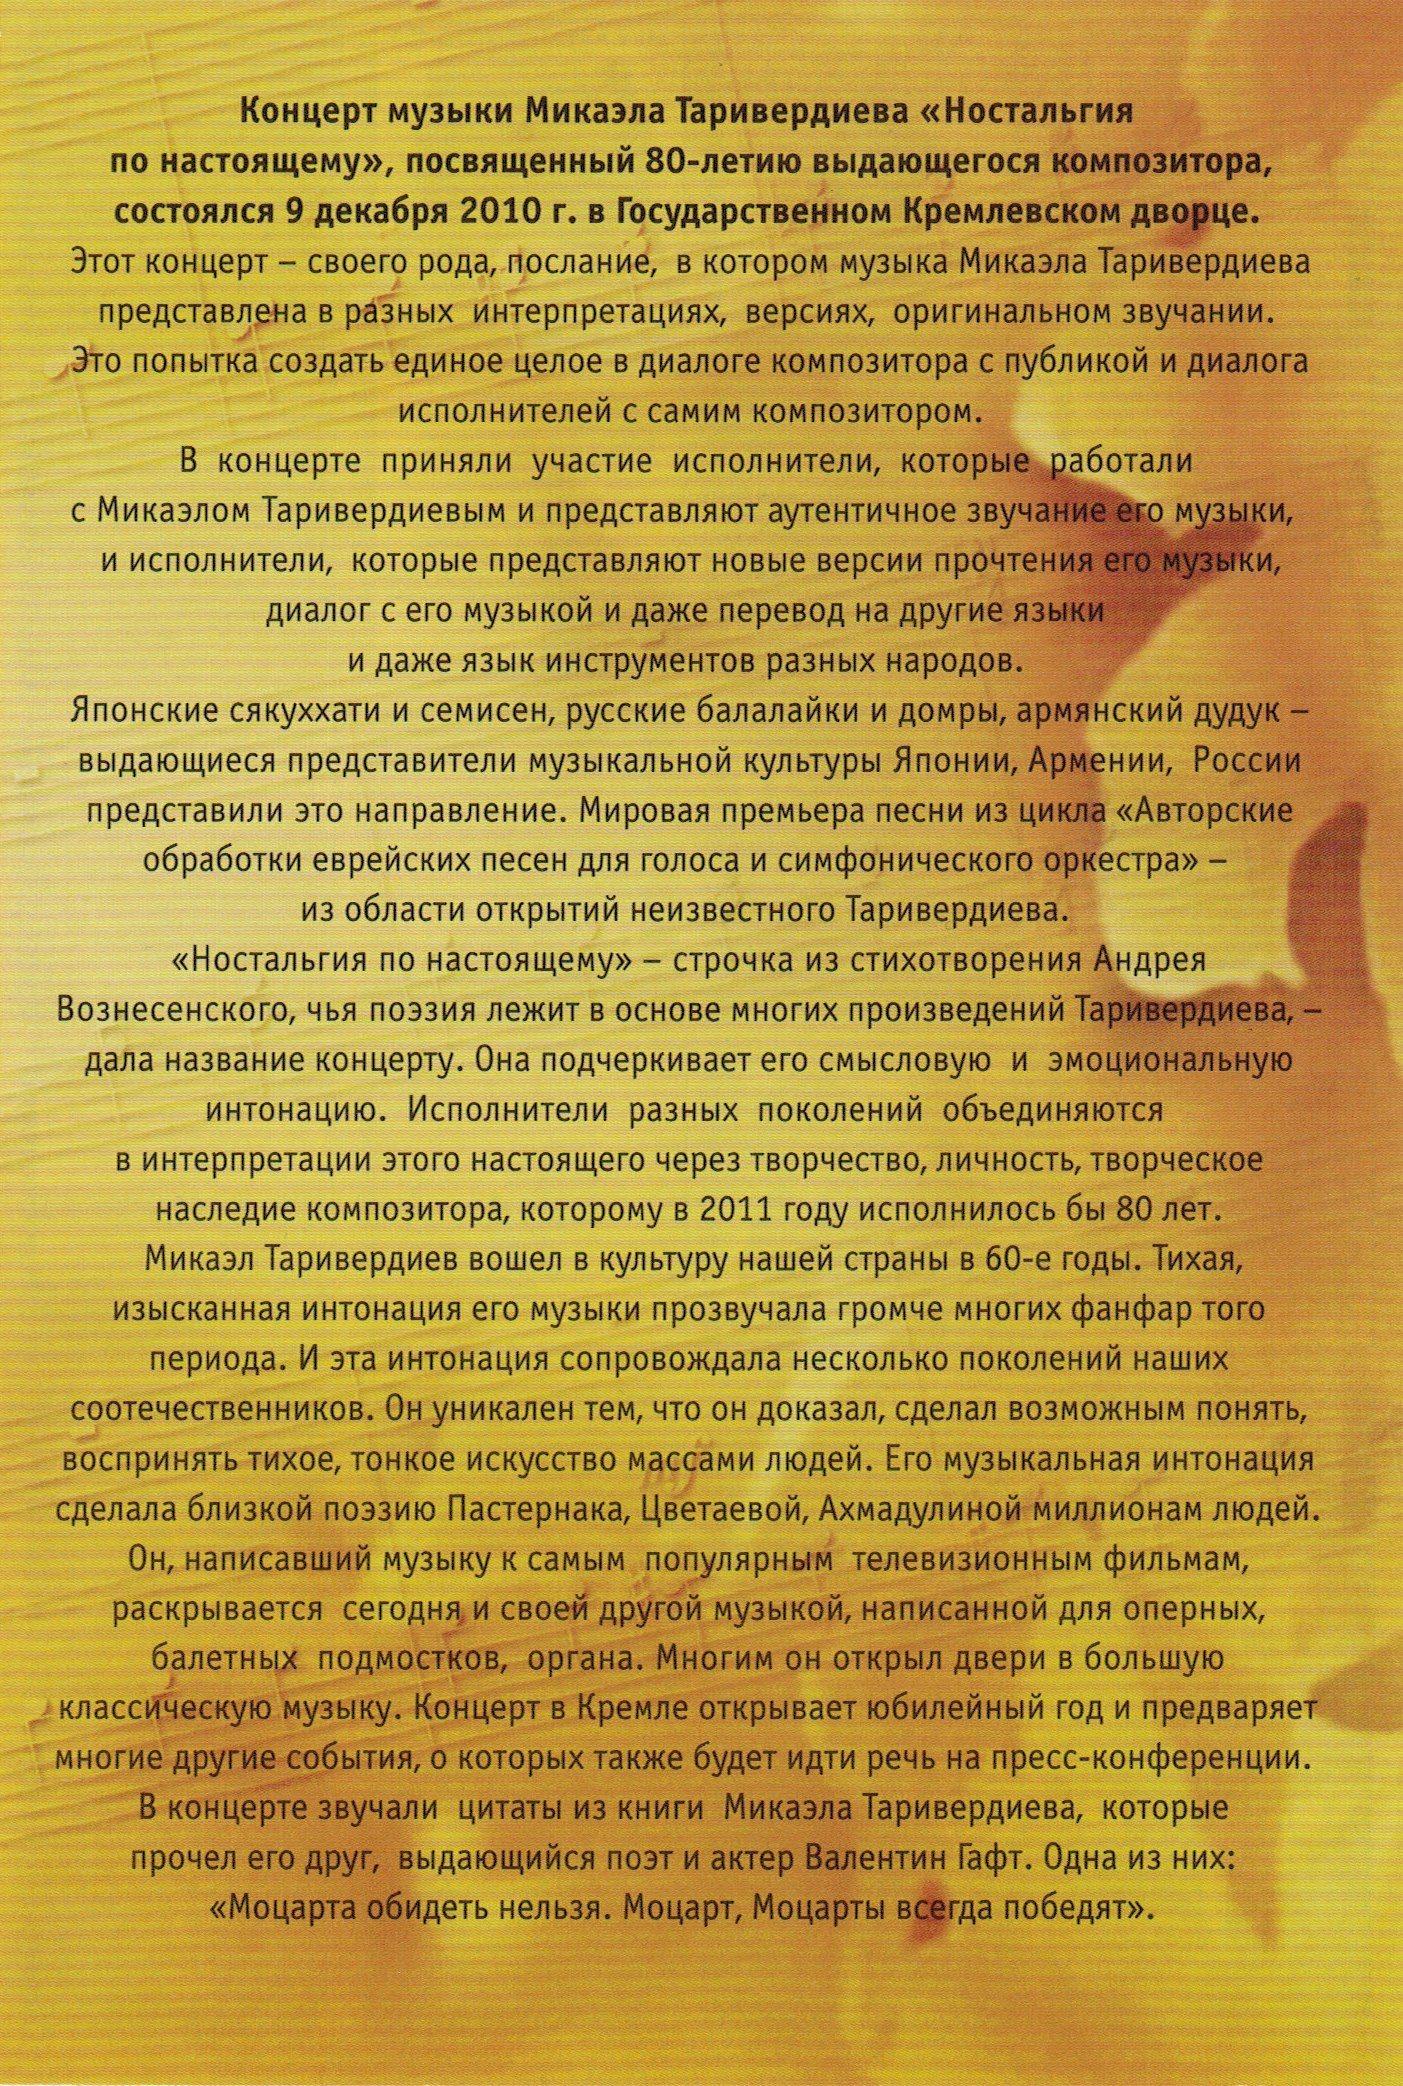 http://i4.imageban.ru/out/2014/07/30/4bbe6ec395503ee70625f3f398f67118.jpg